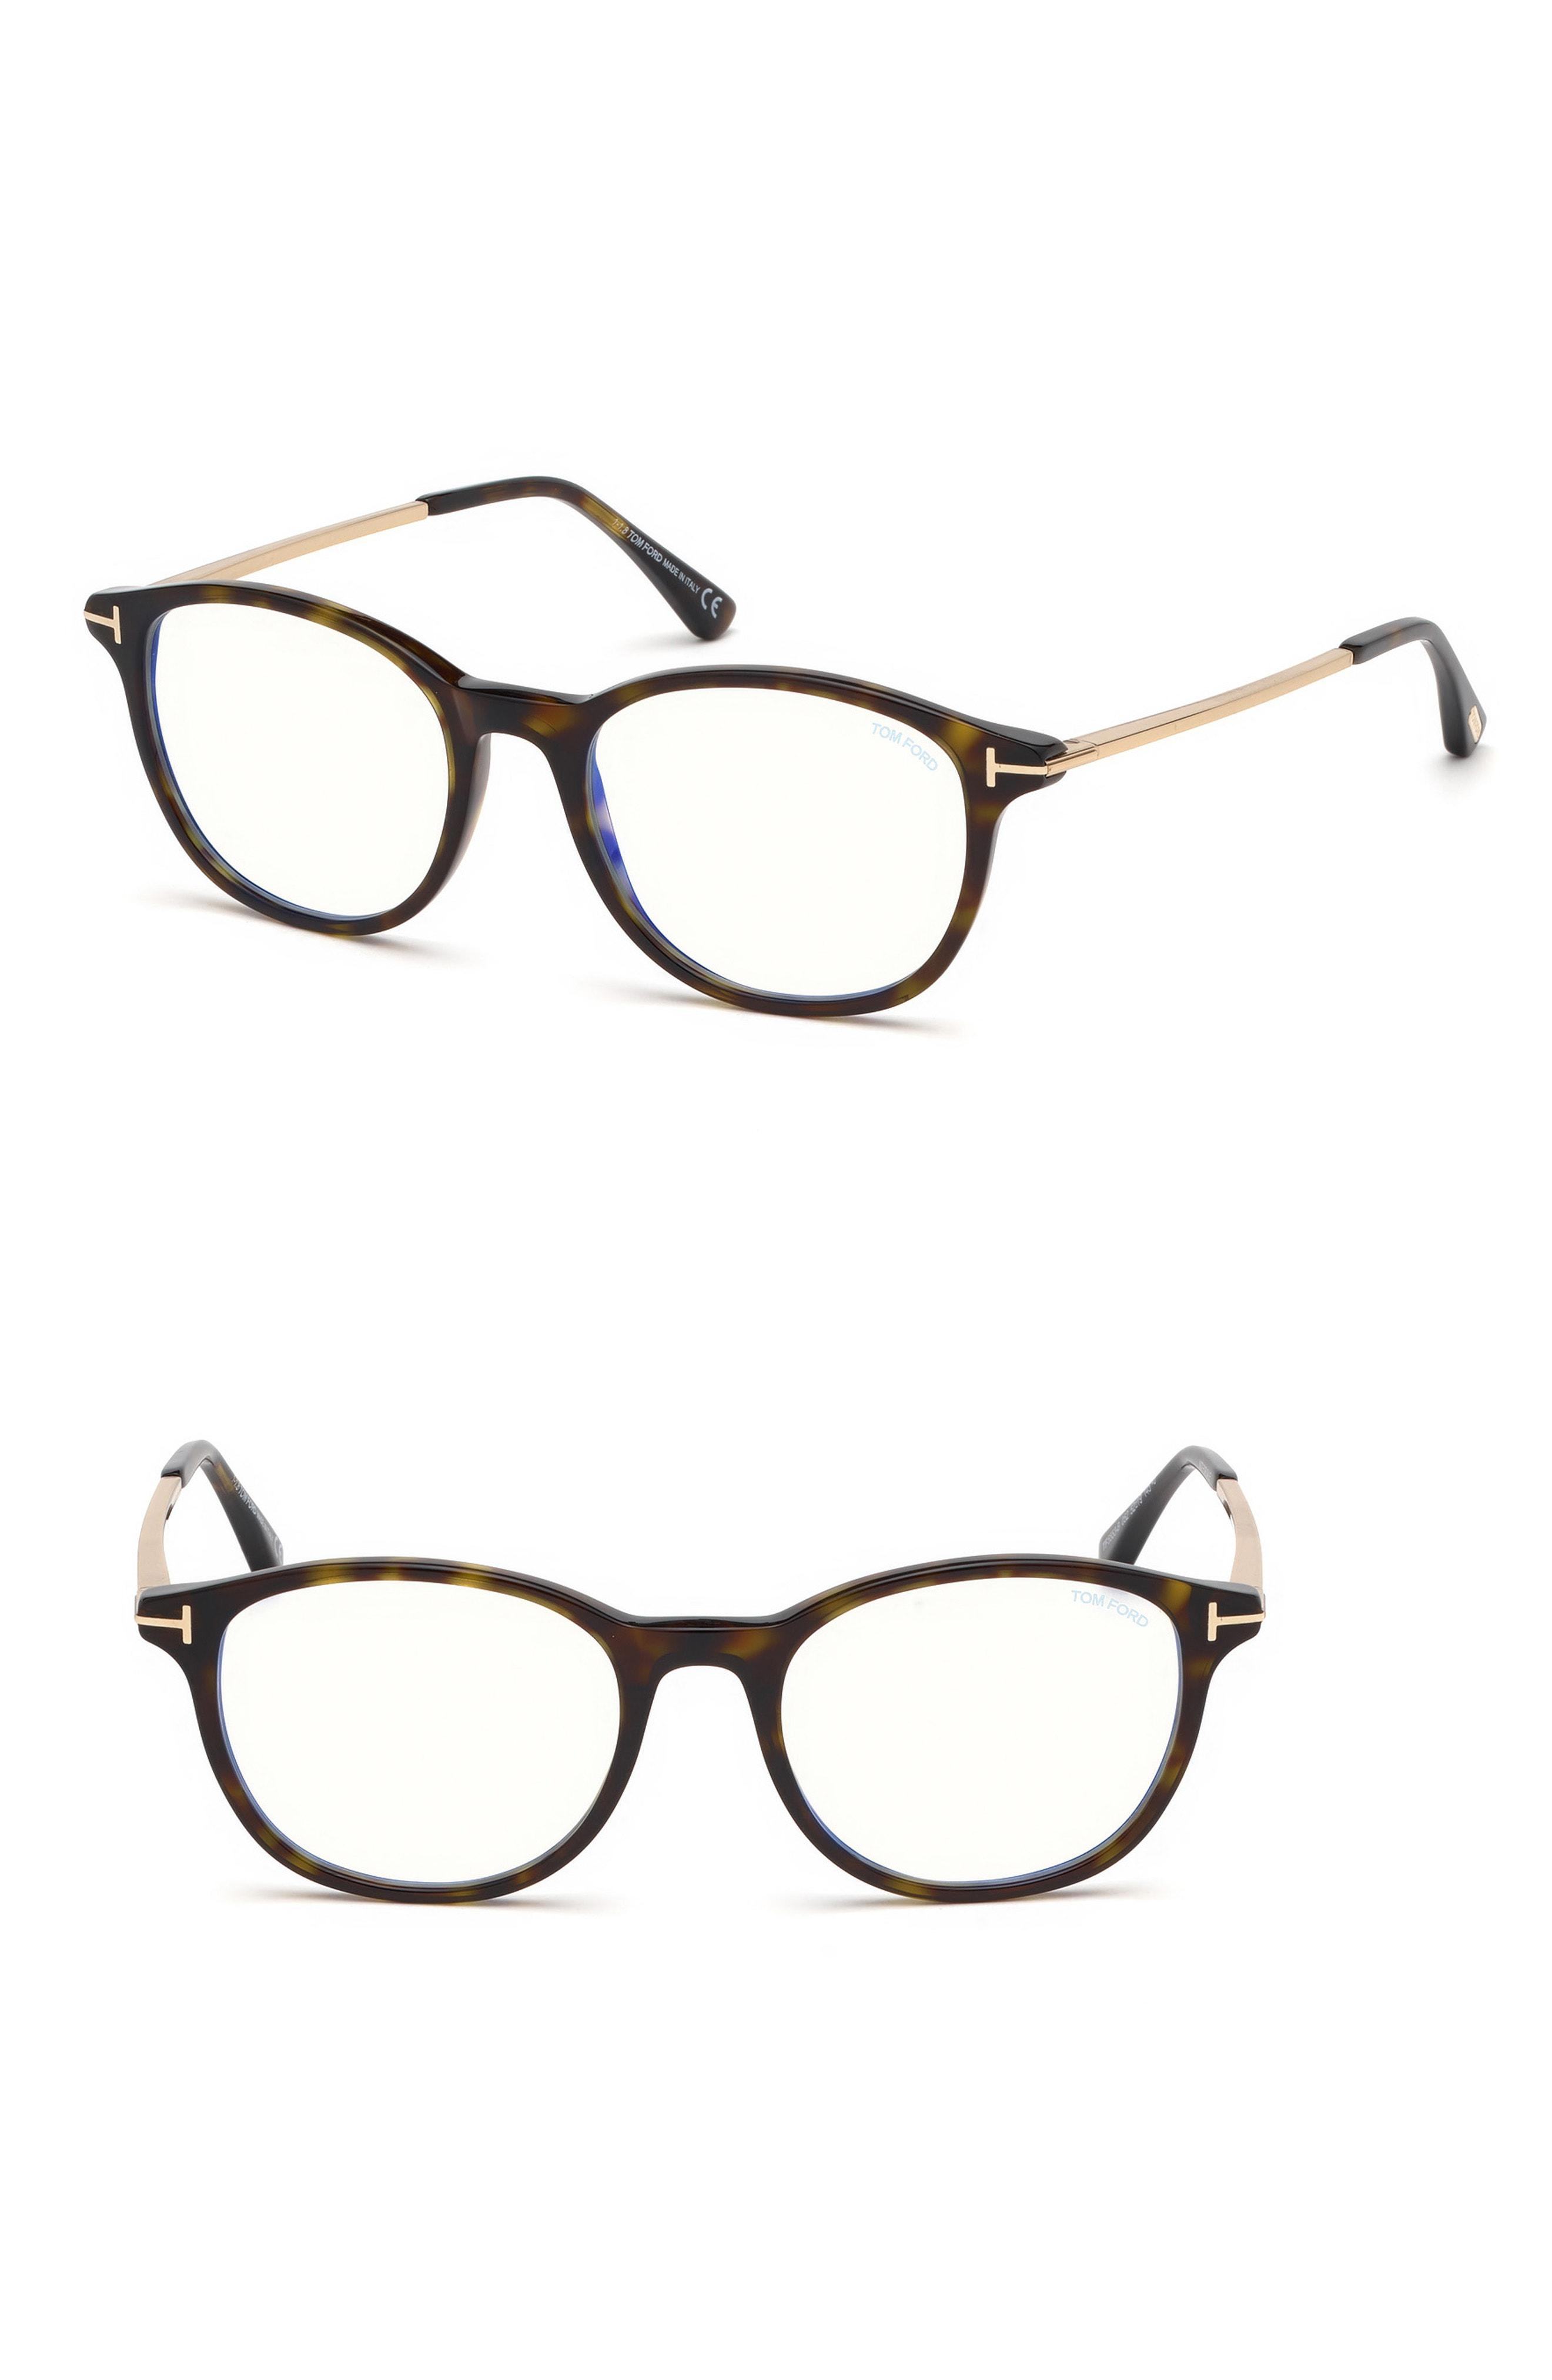 e6b87fe570e Tom Ford 50mm Blue Light Blocking Glasses - Shiny Dark Havana  Blue ...